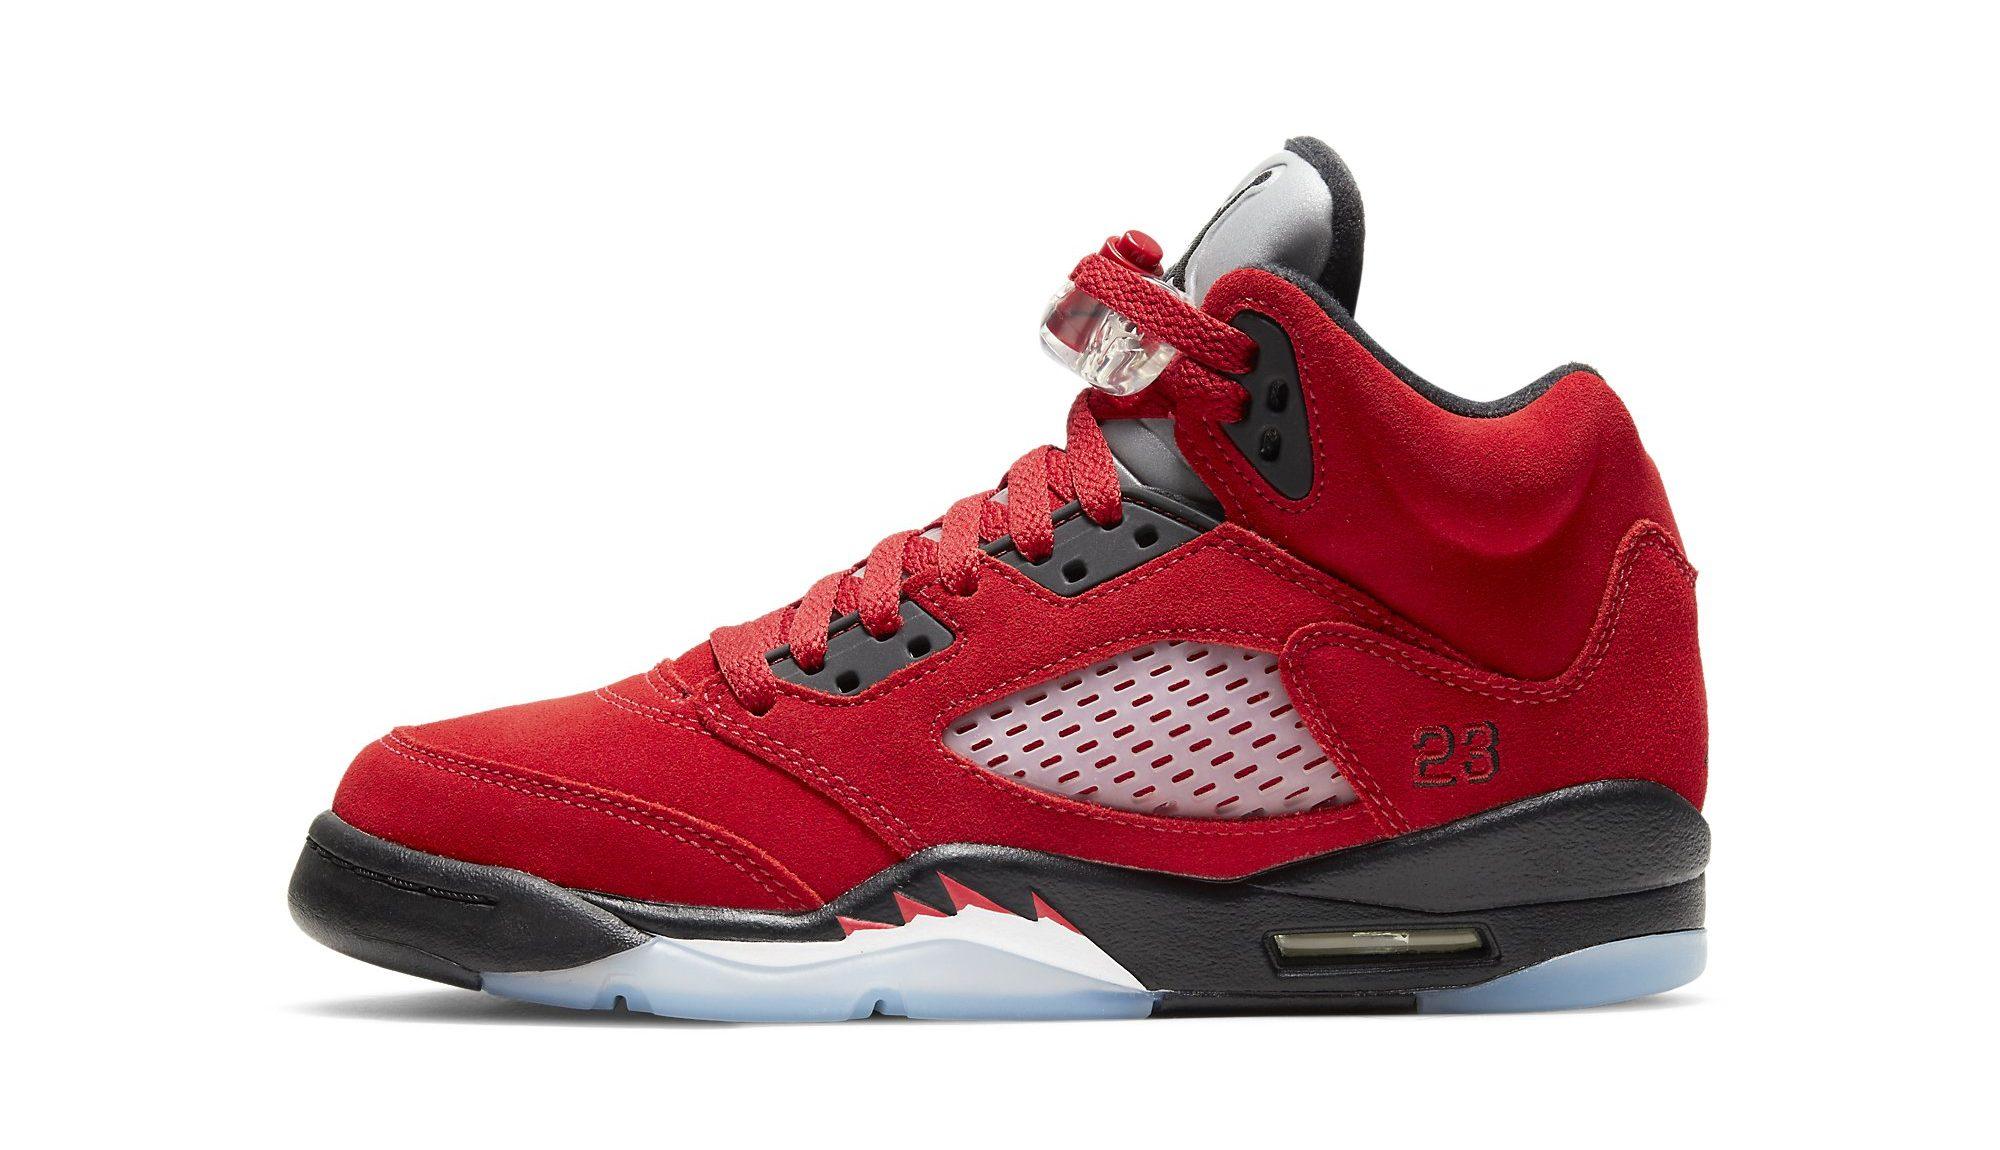 Air Jordan 5 'Raging Bull' 2021: First Look & Release Info ...